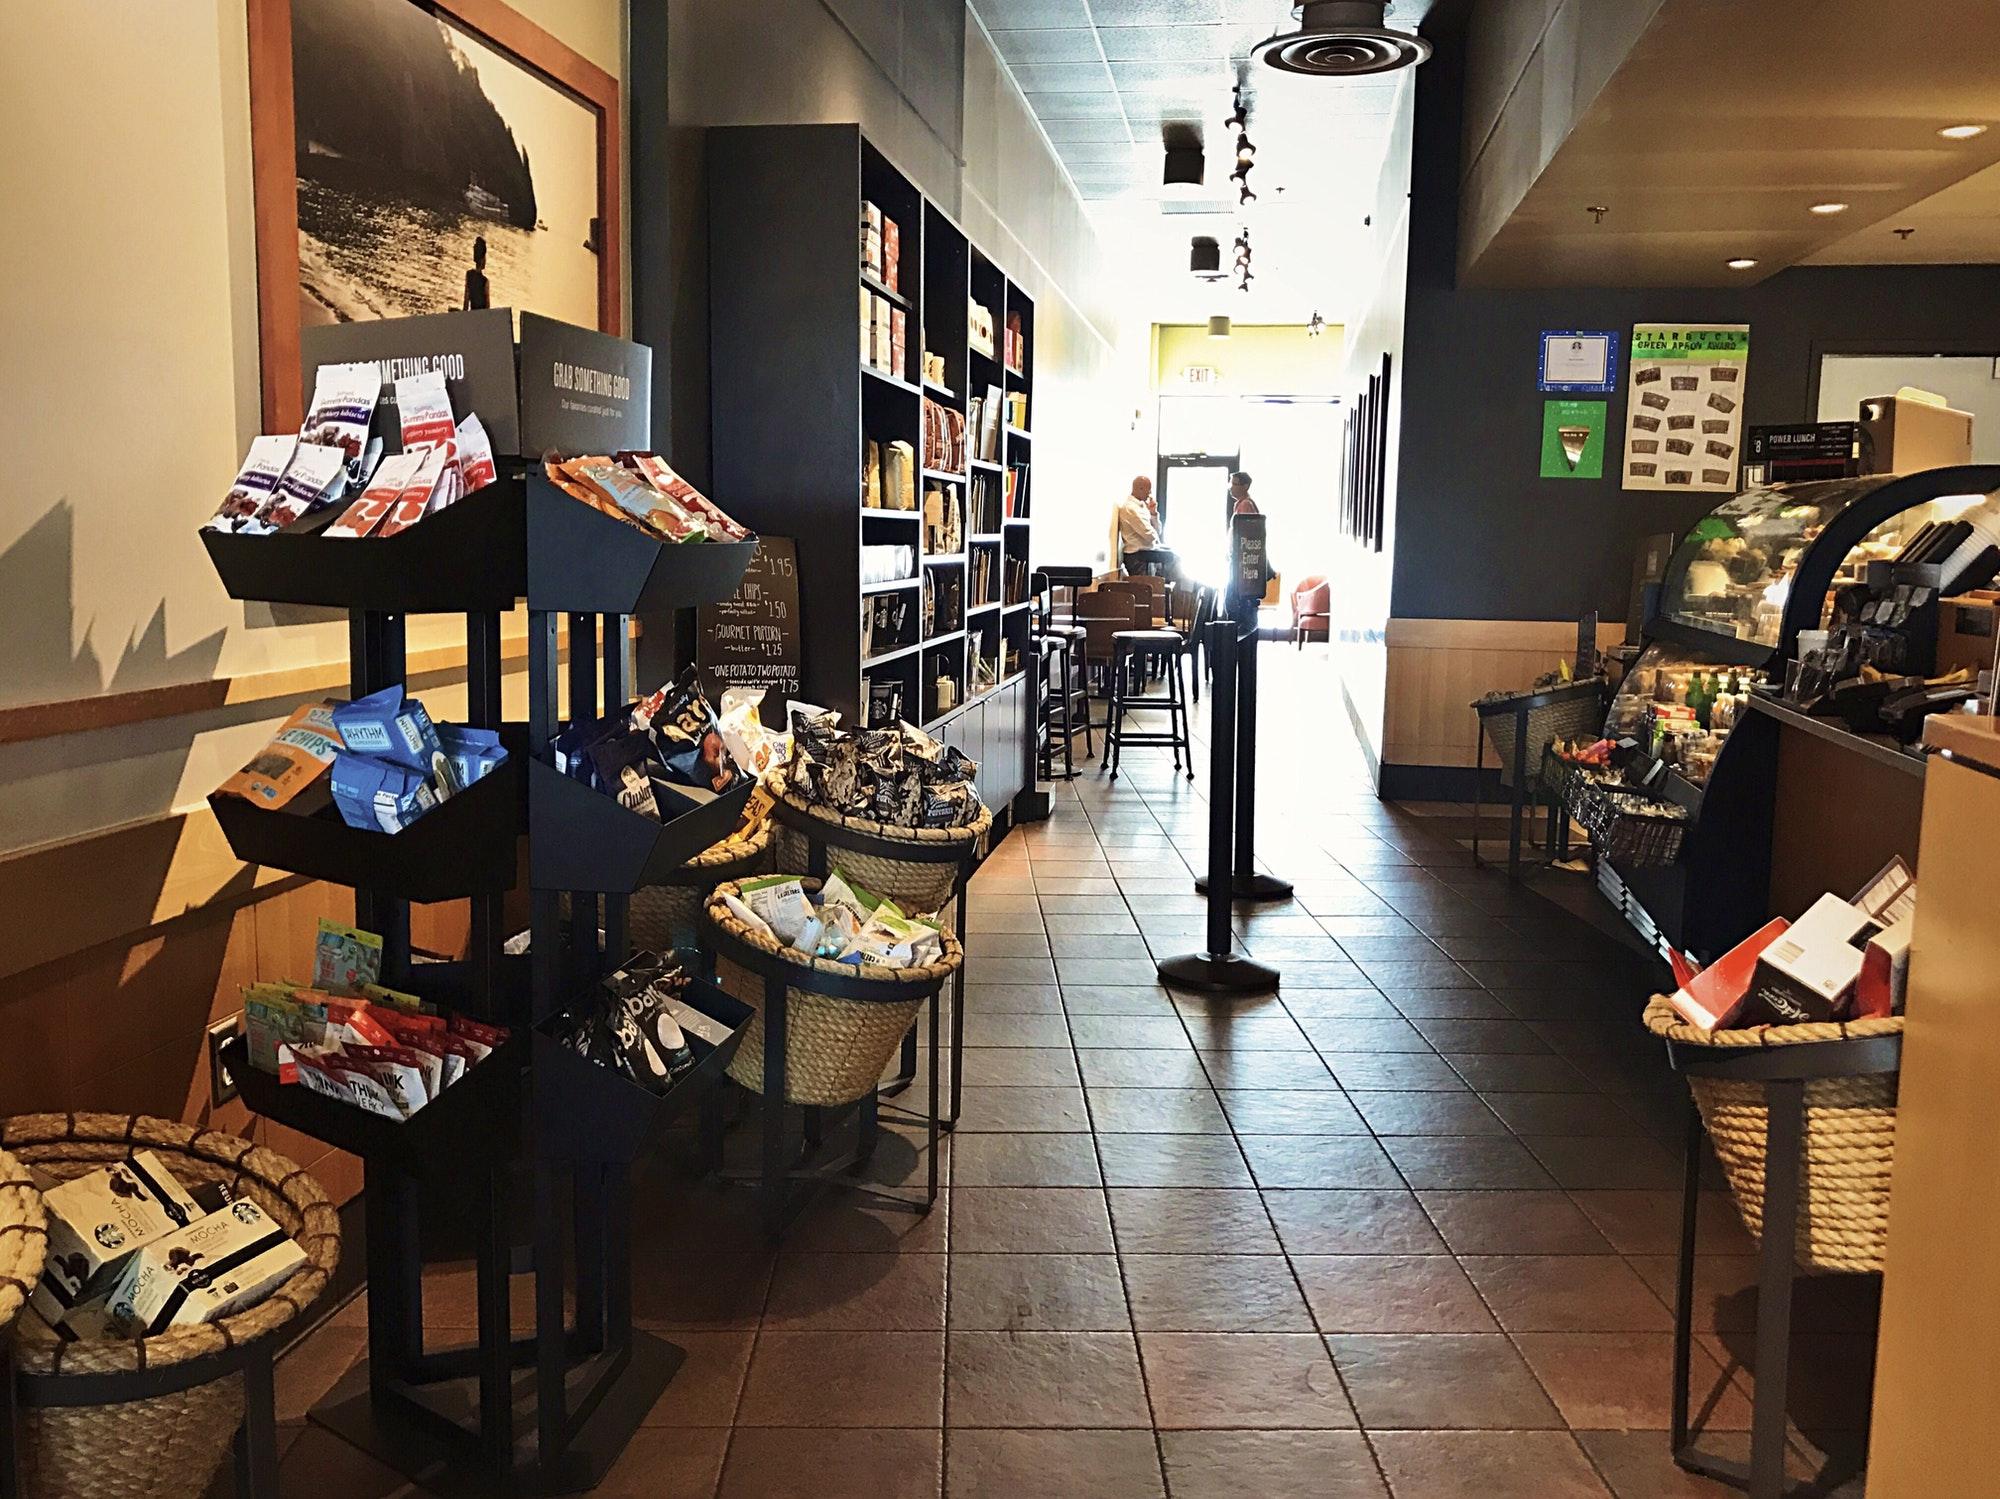 Starbucks Interior Shot